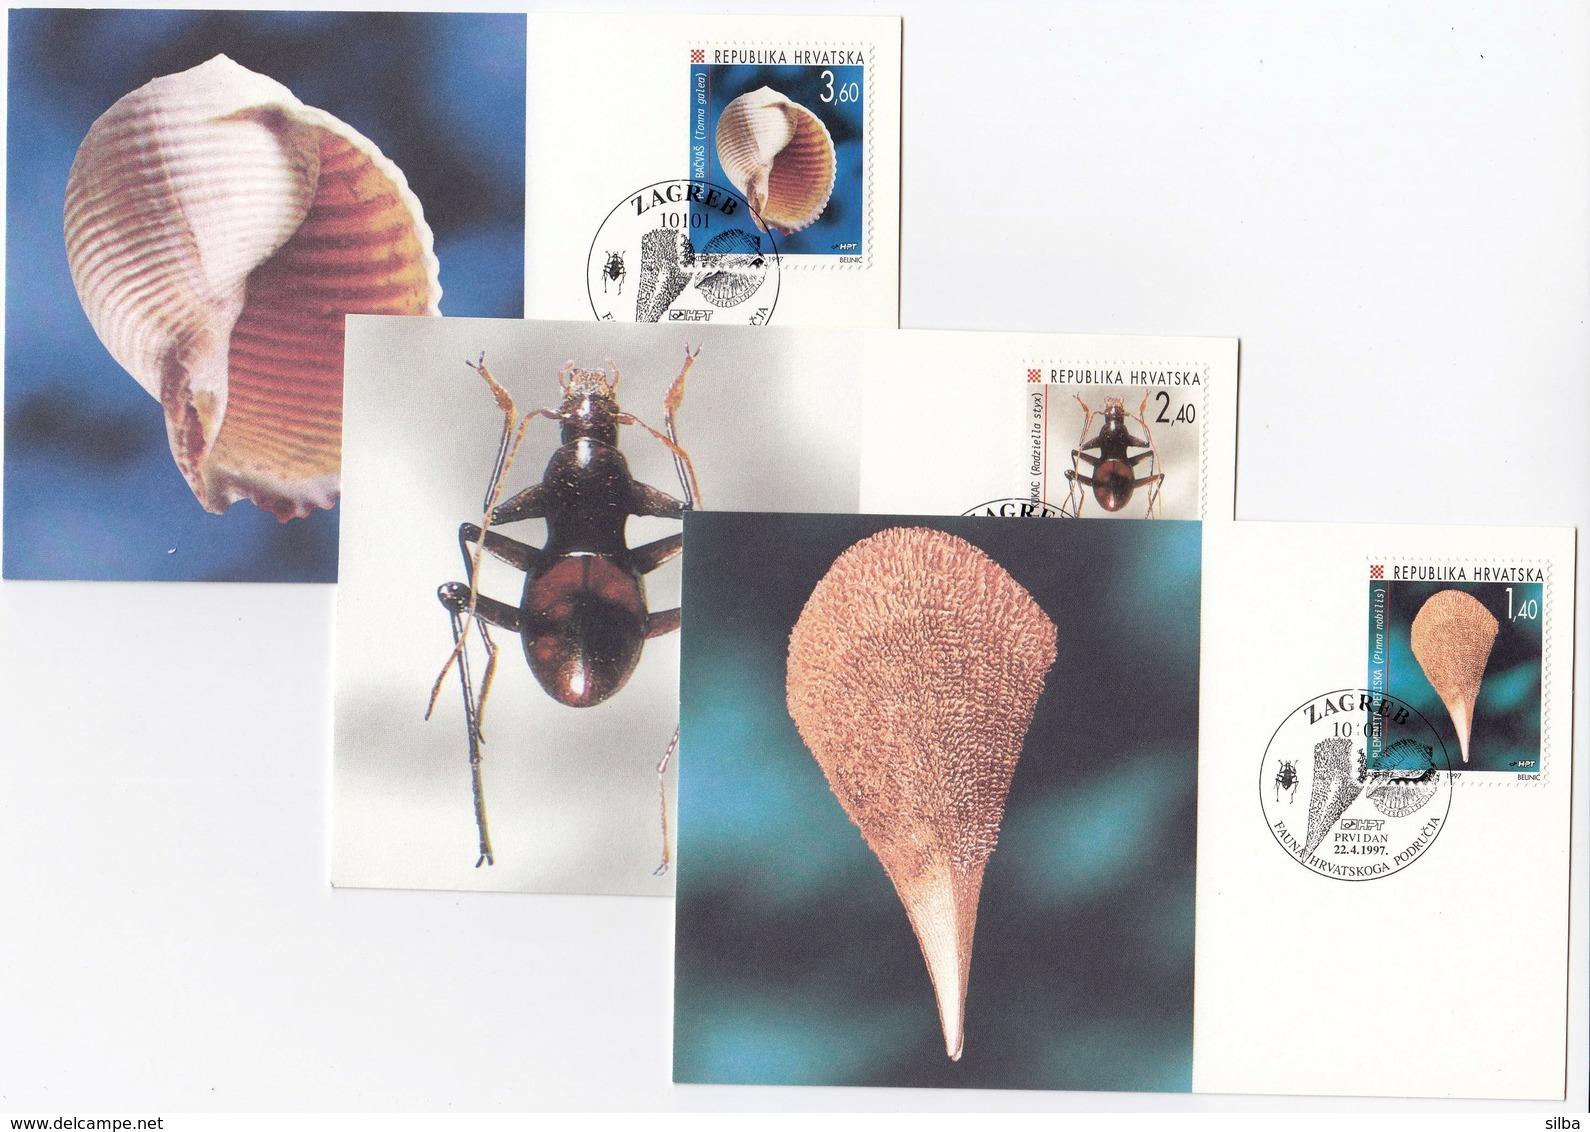 Croatia Zagreb 1997 / Fauna Of Croatian Territory / Noble Pen Shell, Cave Insect, Snail / MC - Croatie